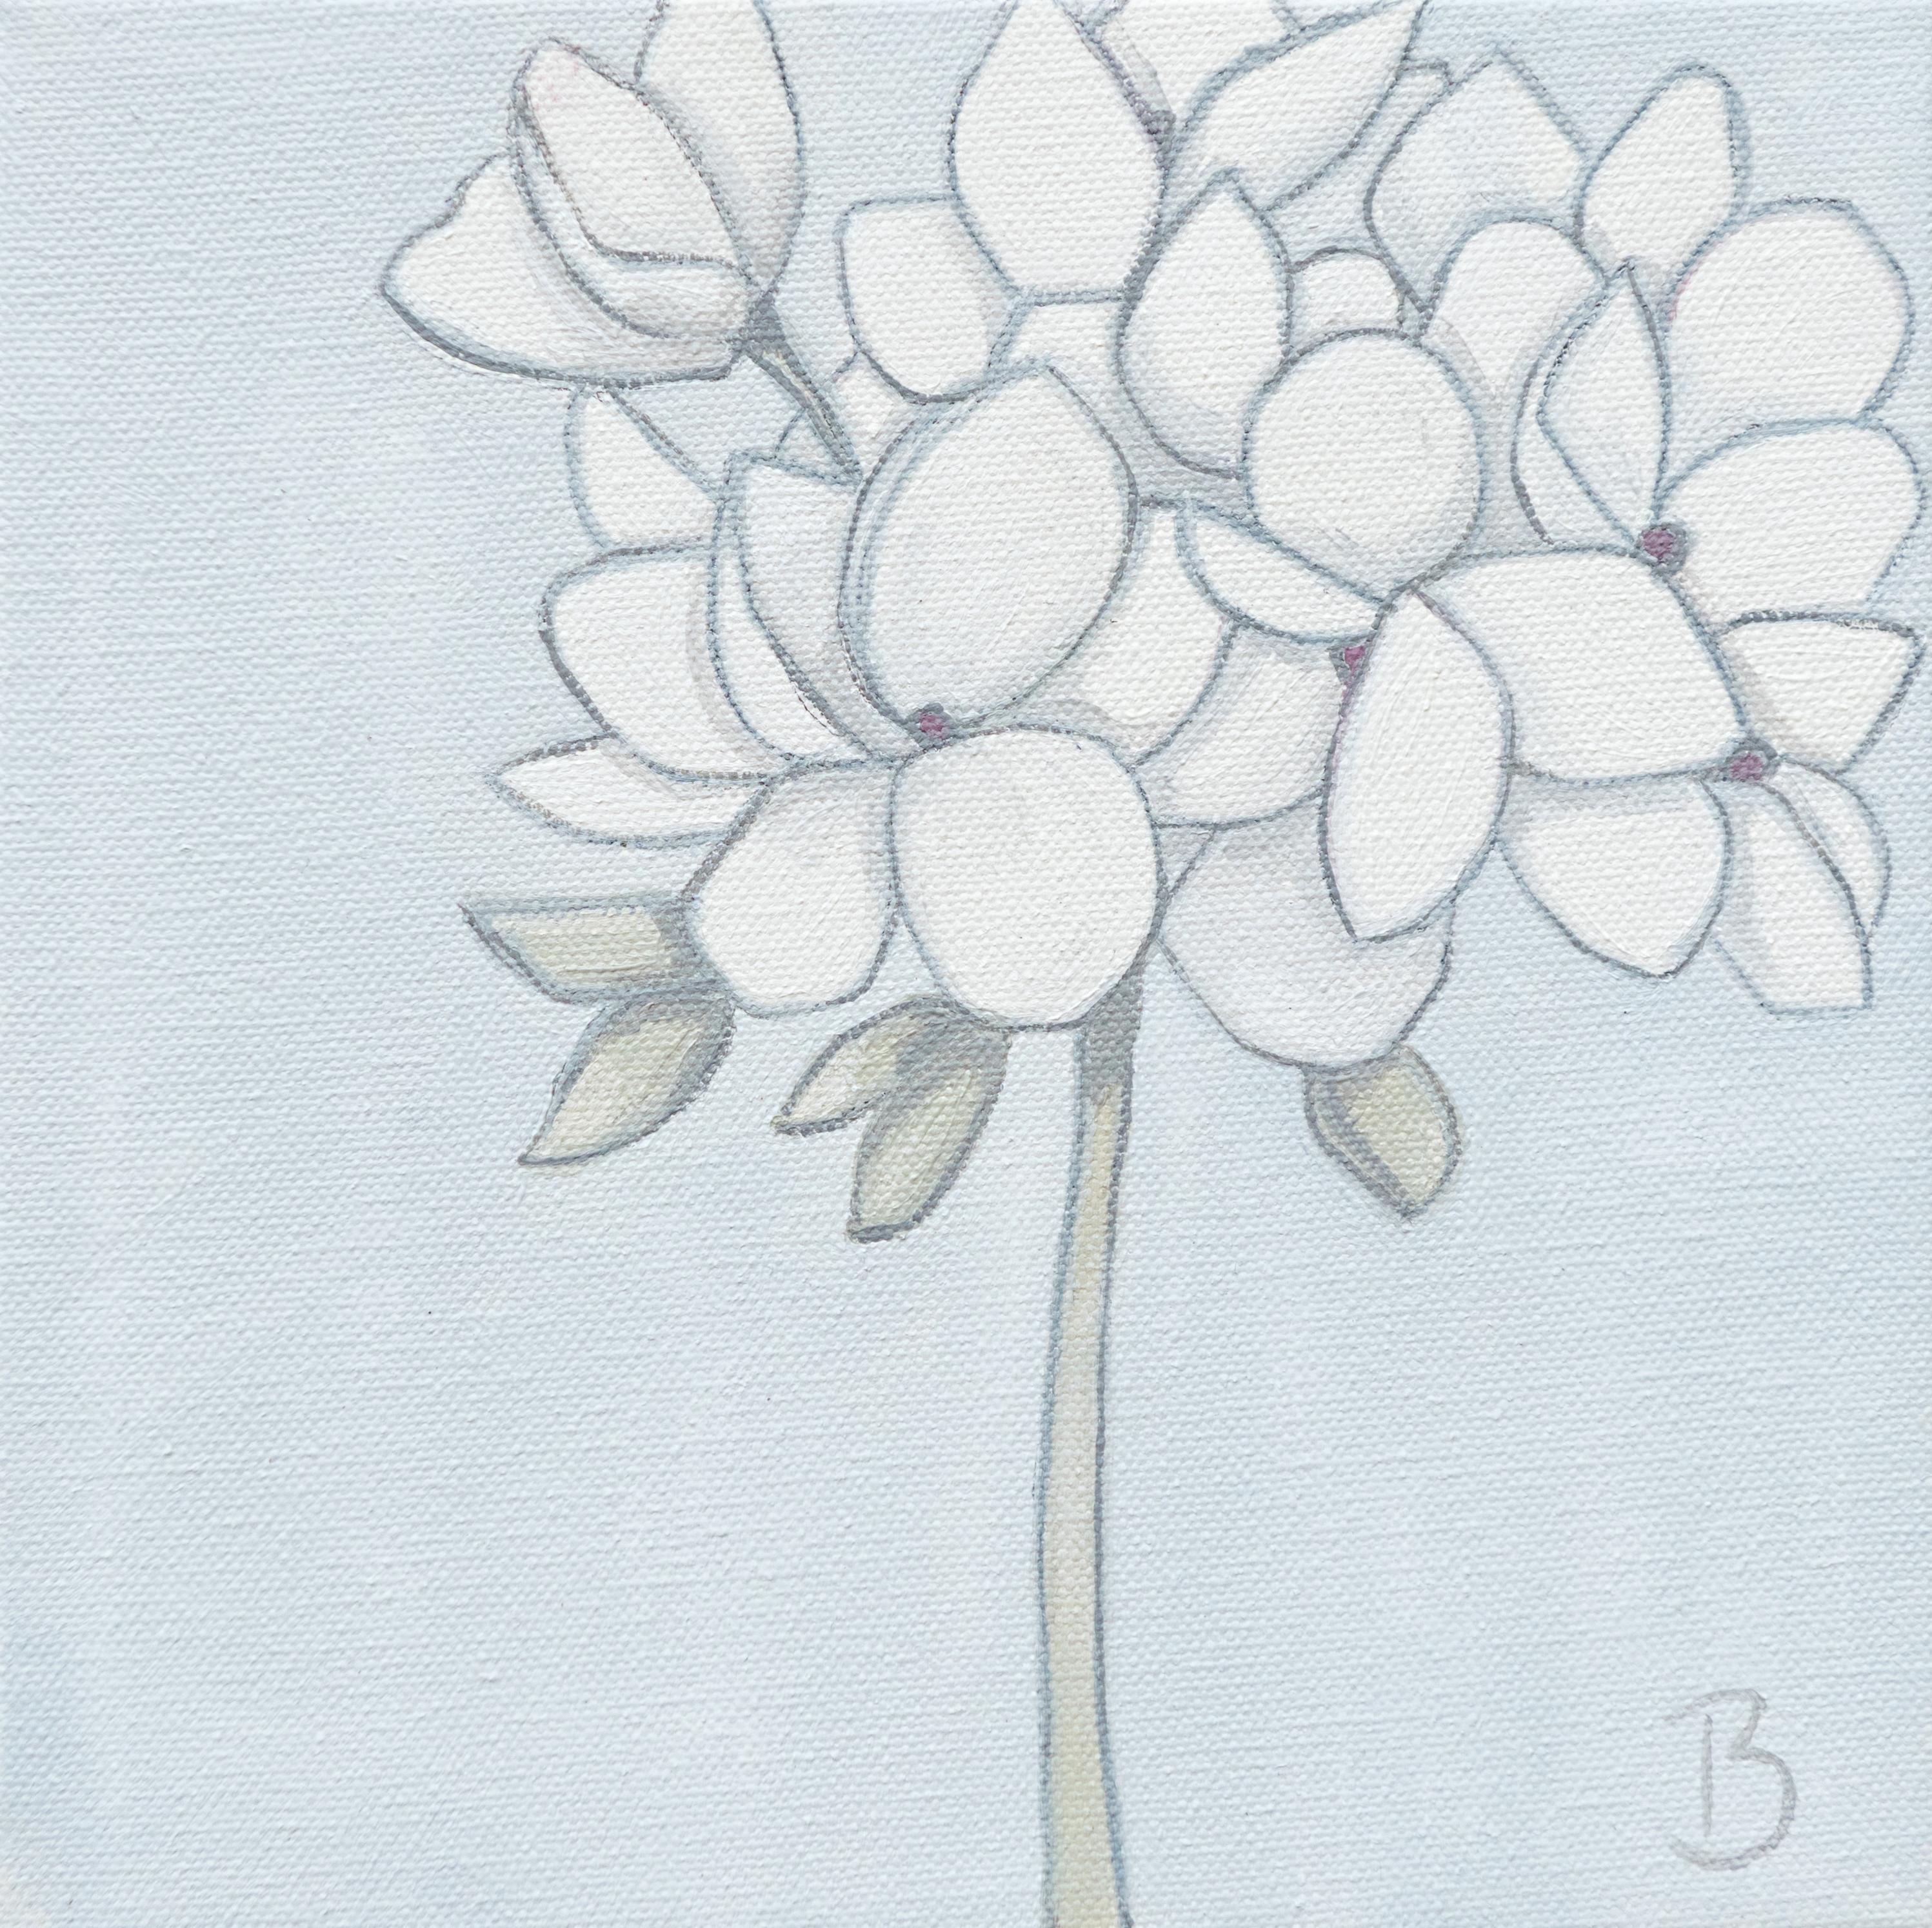 Geraniums Family Study 1  8x8